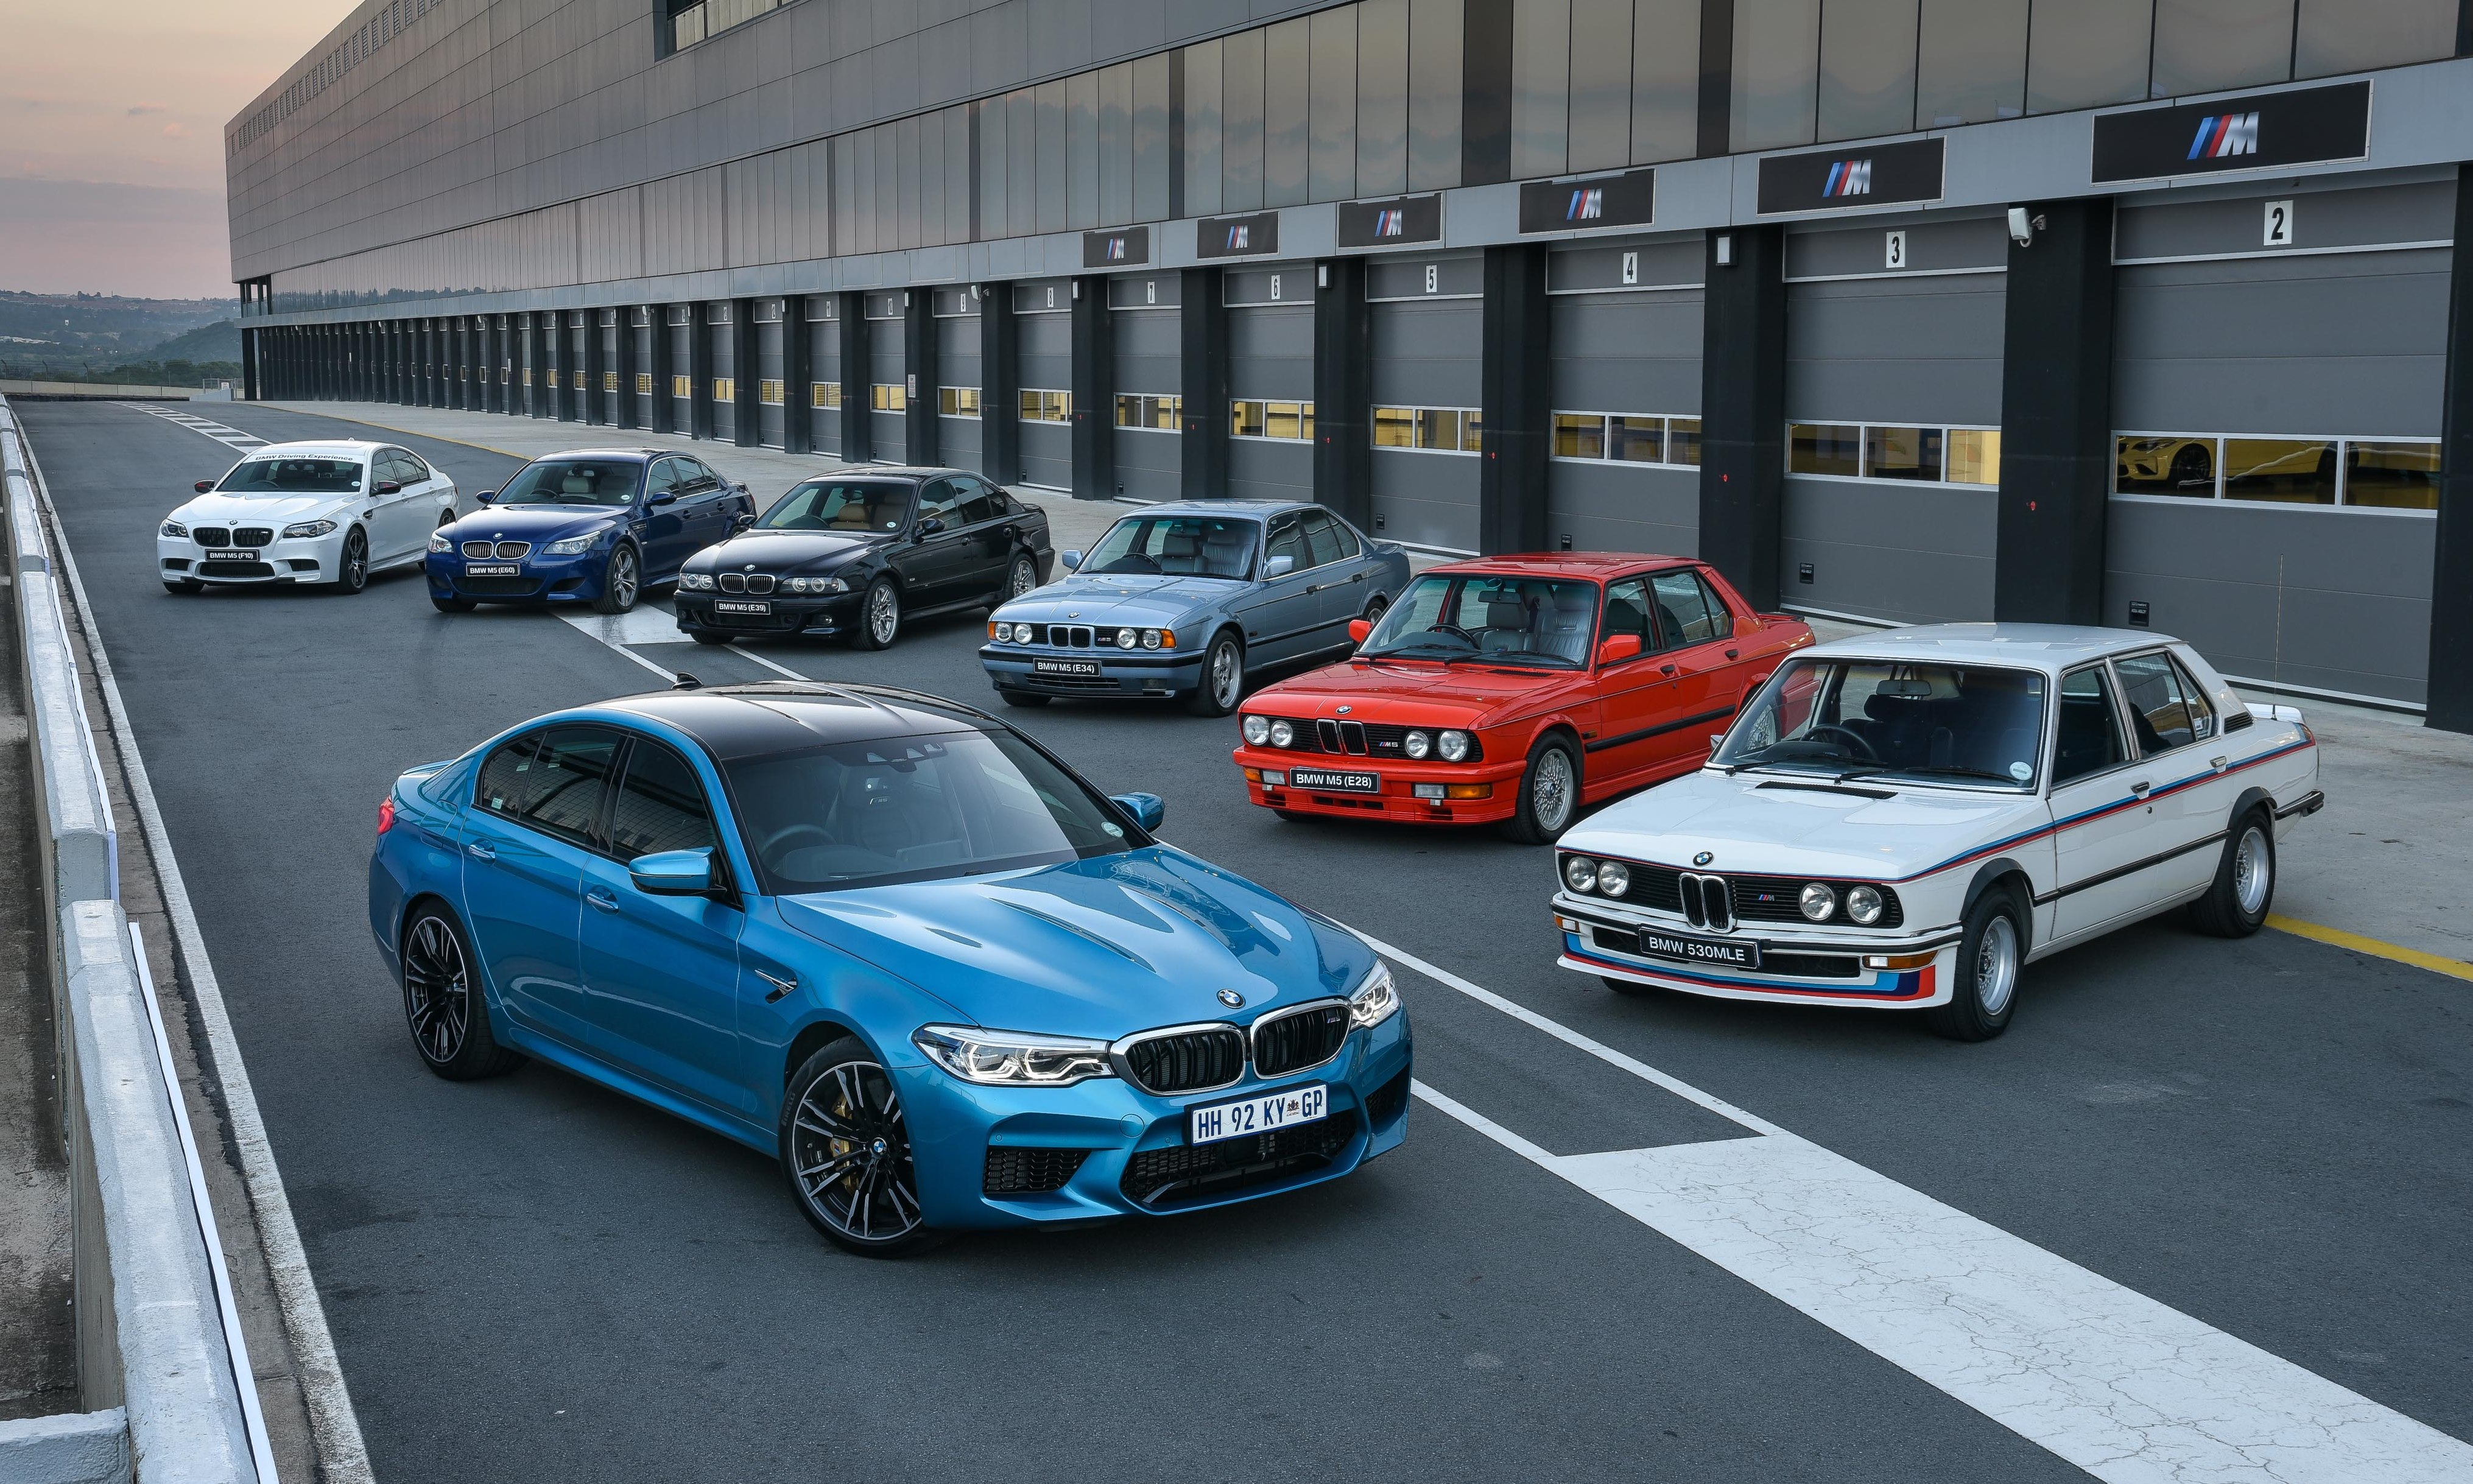 BMW M5 family